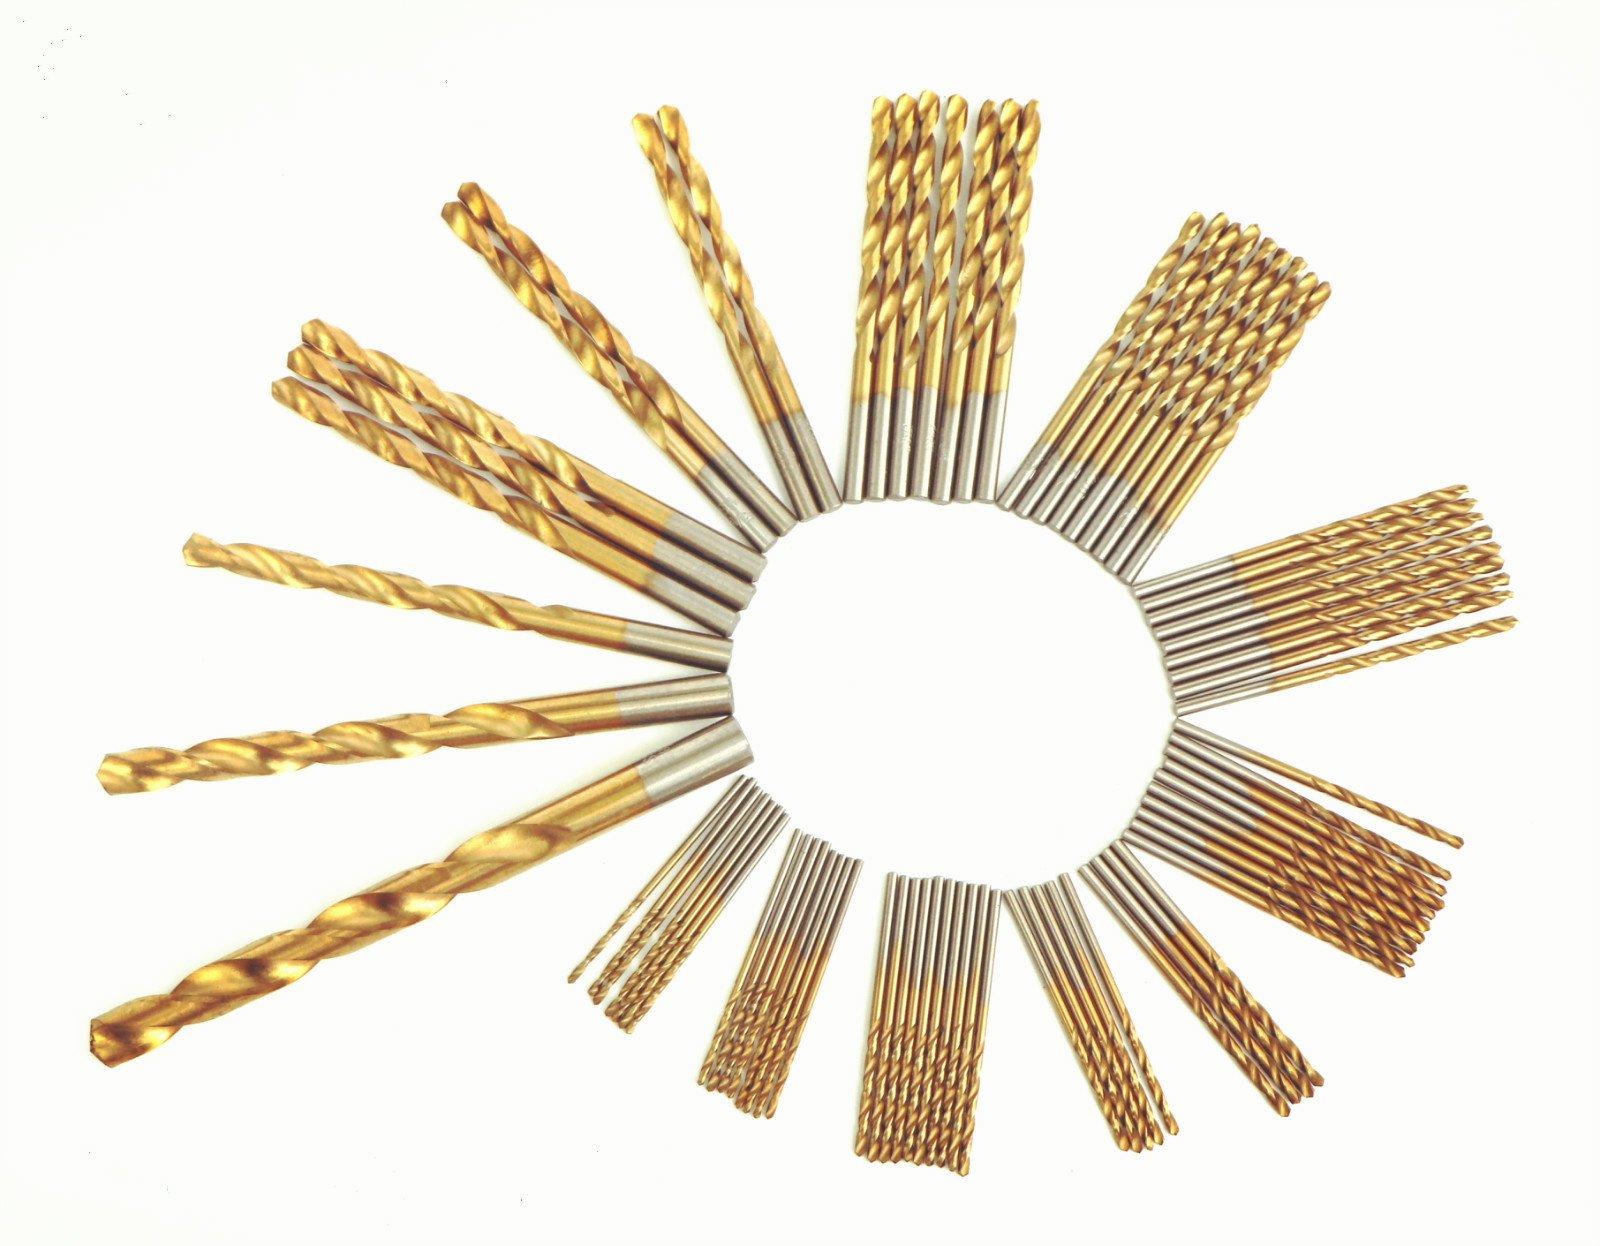 DRILLFORCE, 160 PCS,HSS Titanium Coated Twist Drill Bits Set,3/64''-1/2'', Metal drill, ideal for drilling on mild steel, copper, Aluminum, Zinc alloy etc.